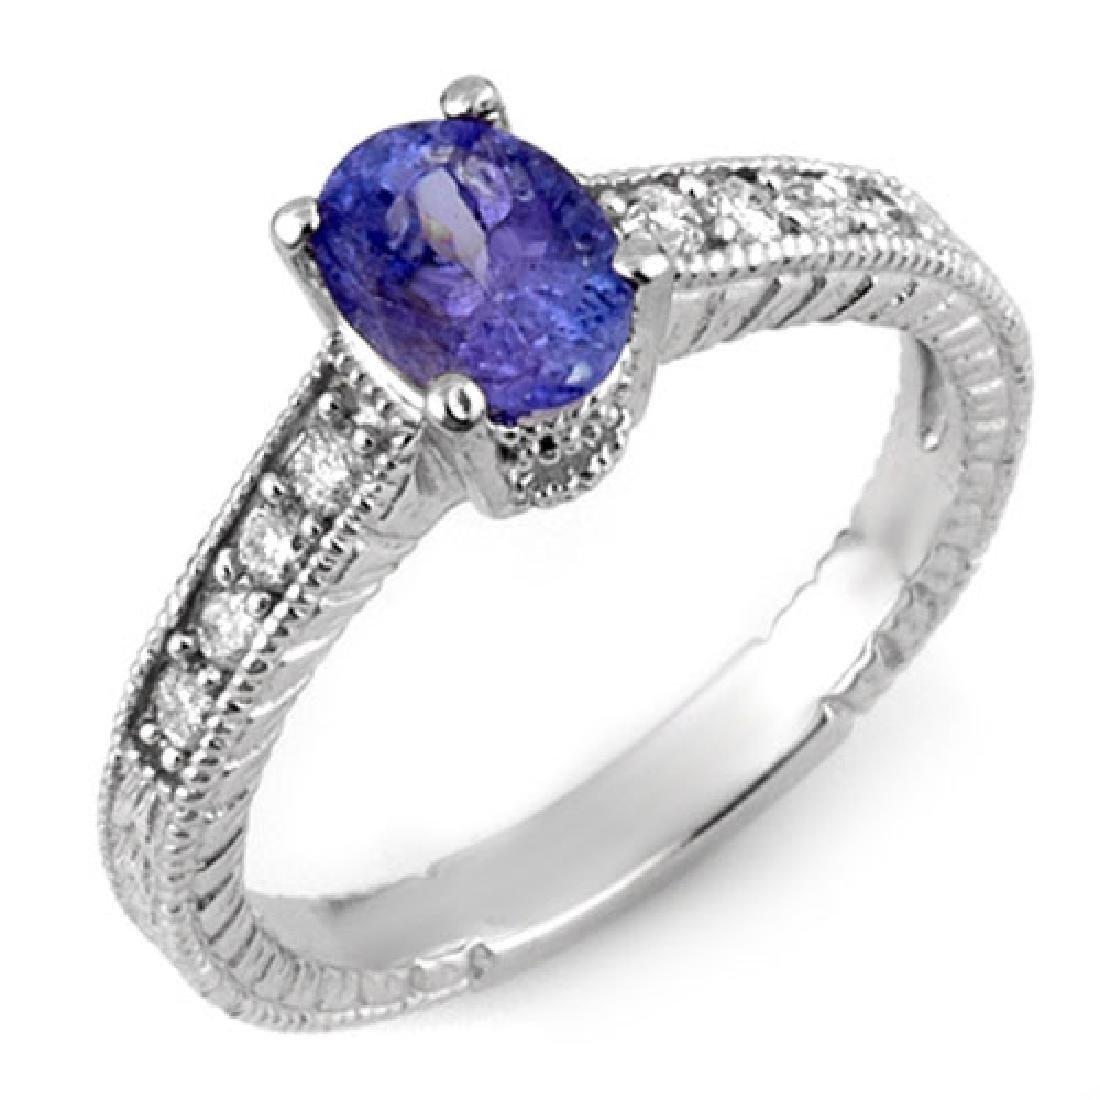 1.25 CTW Tanzanite & Diamond Ring 14K White Gold